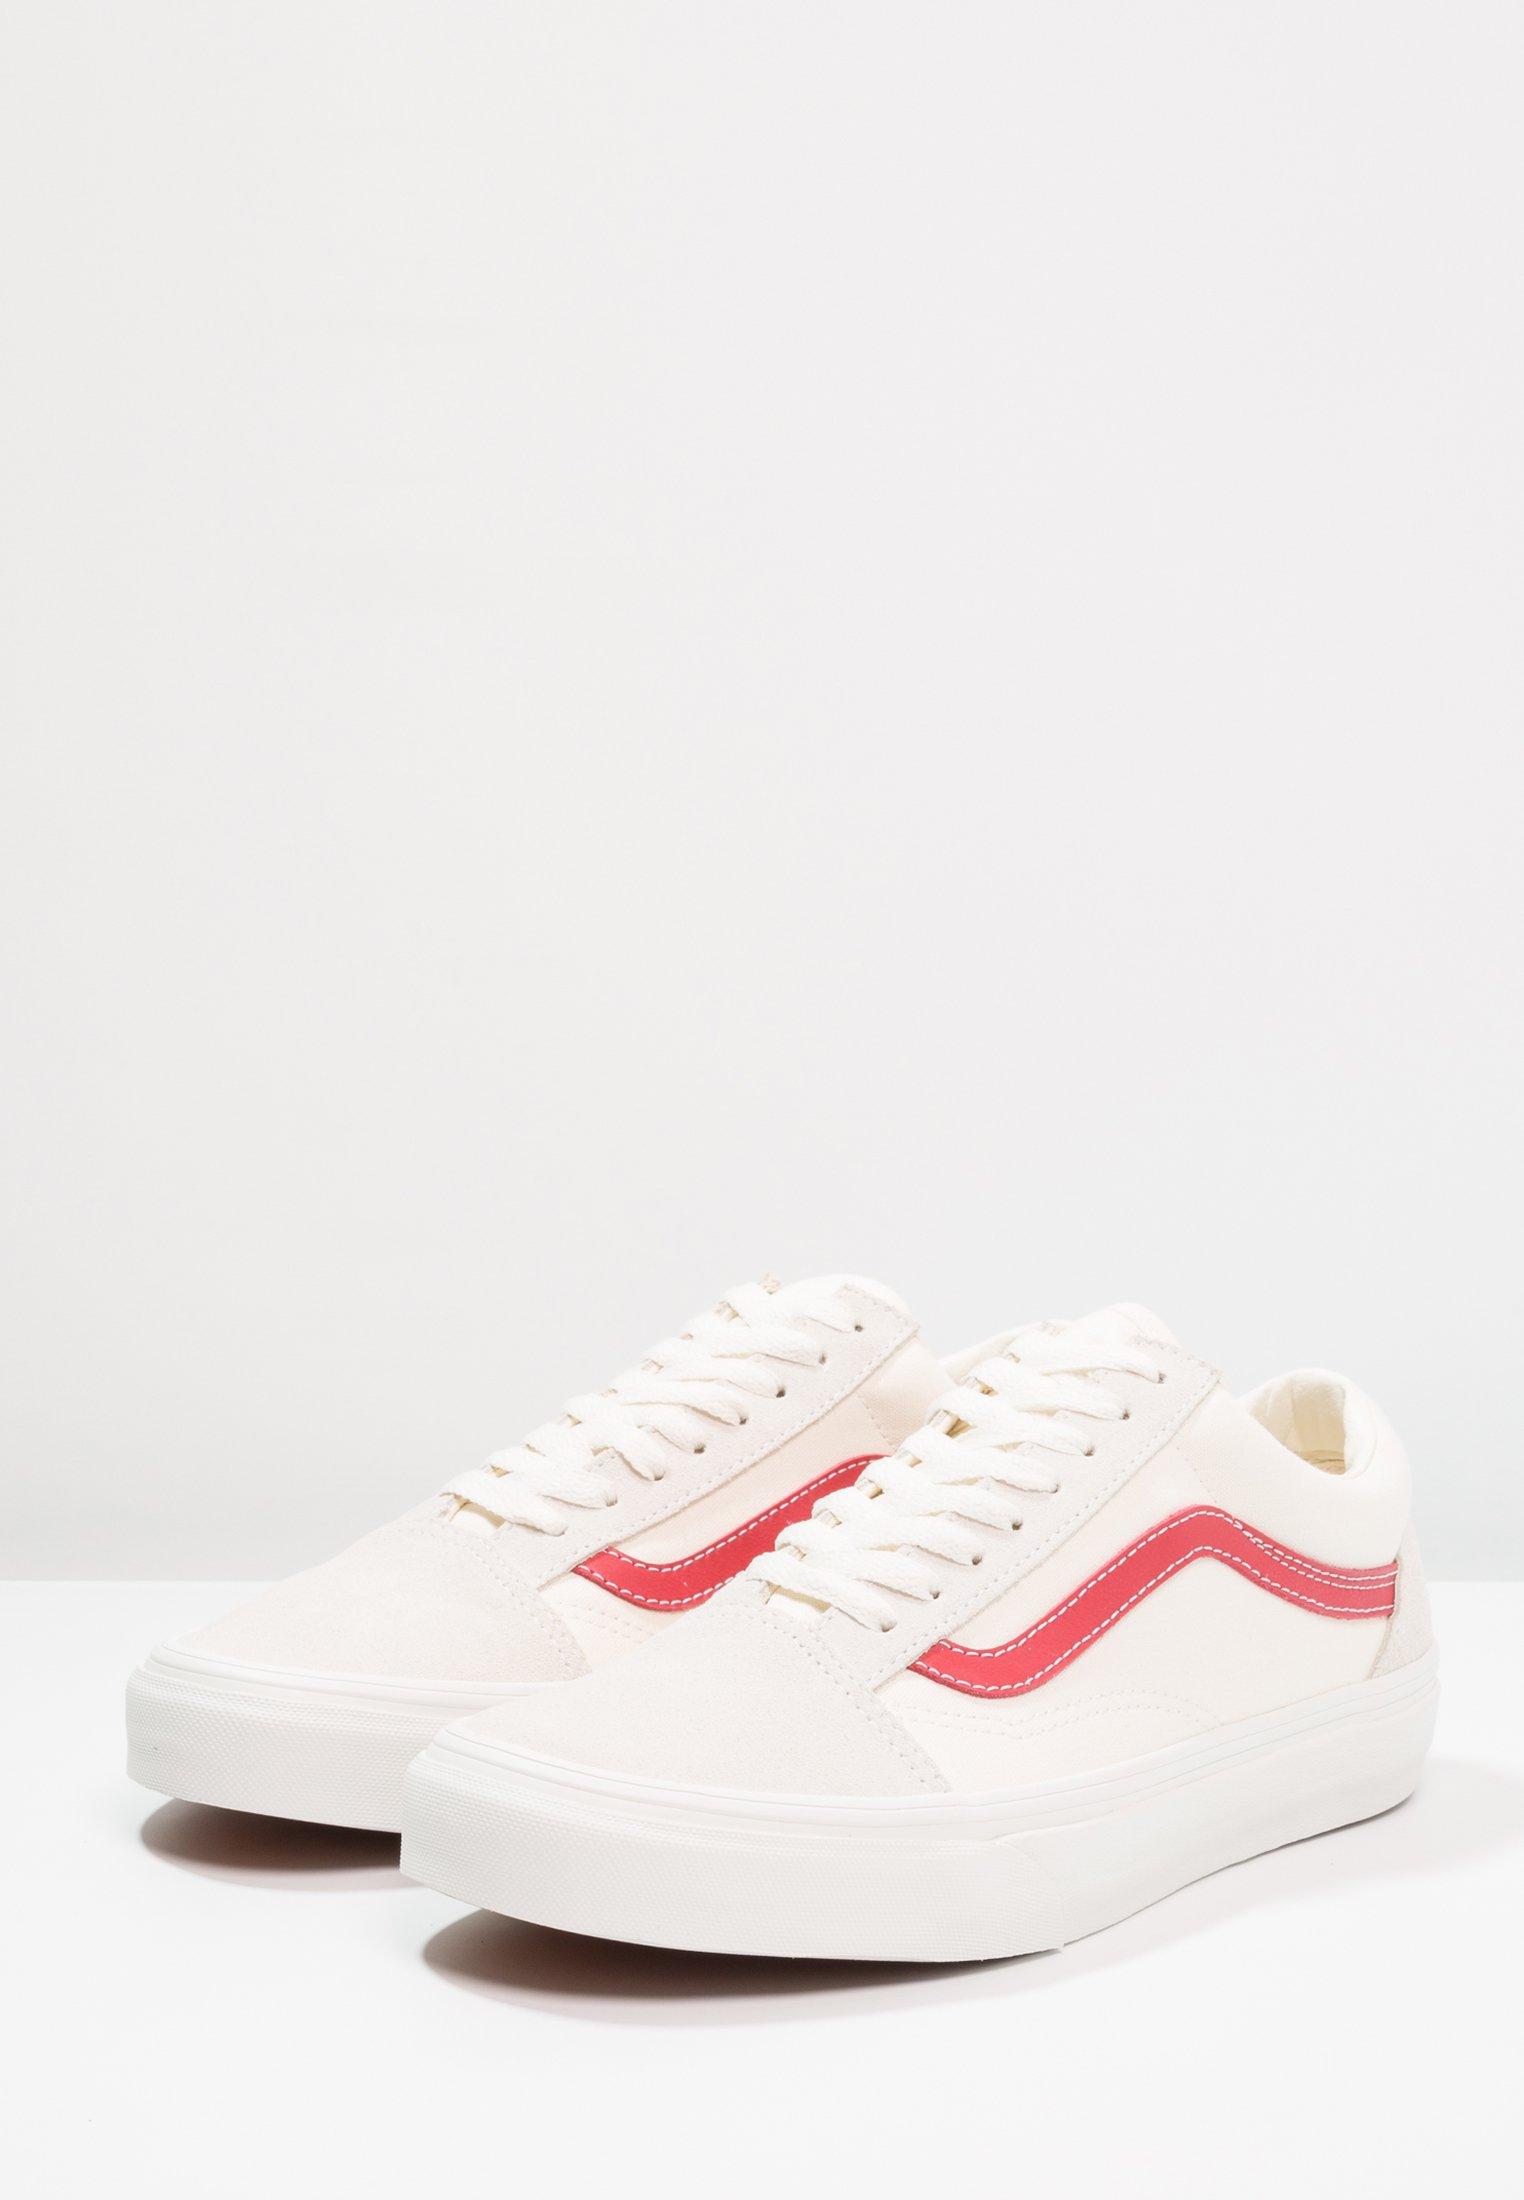 UA OLD SKOOL Baskets basses vintage whiterococco red